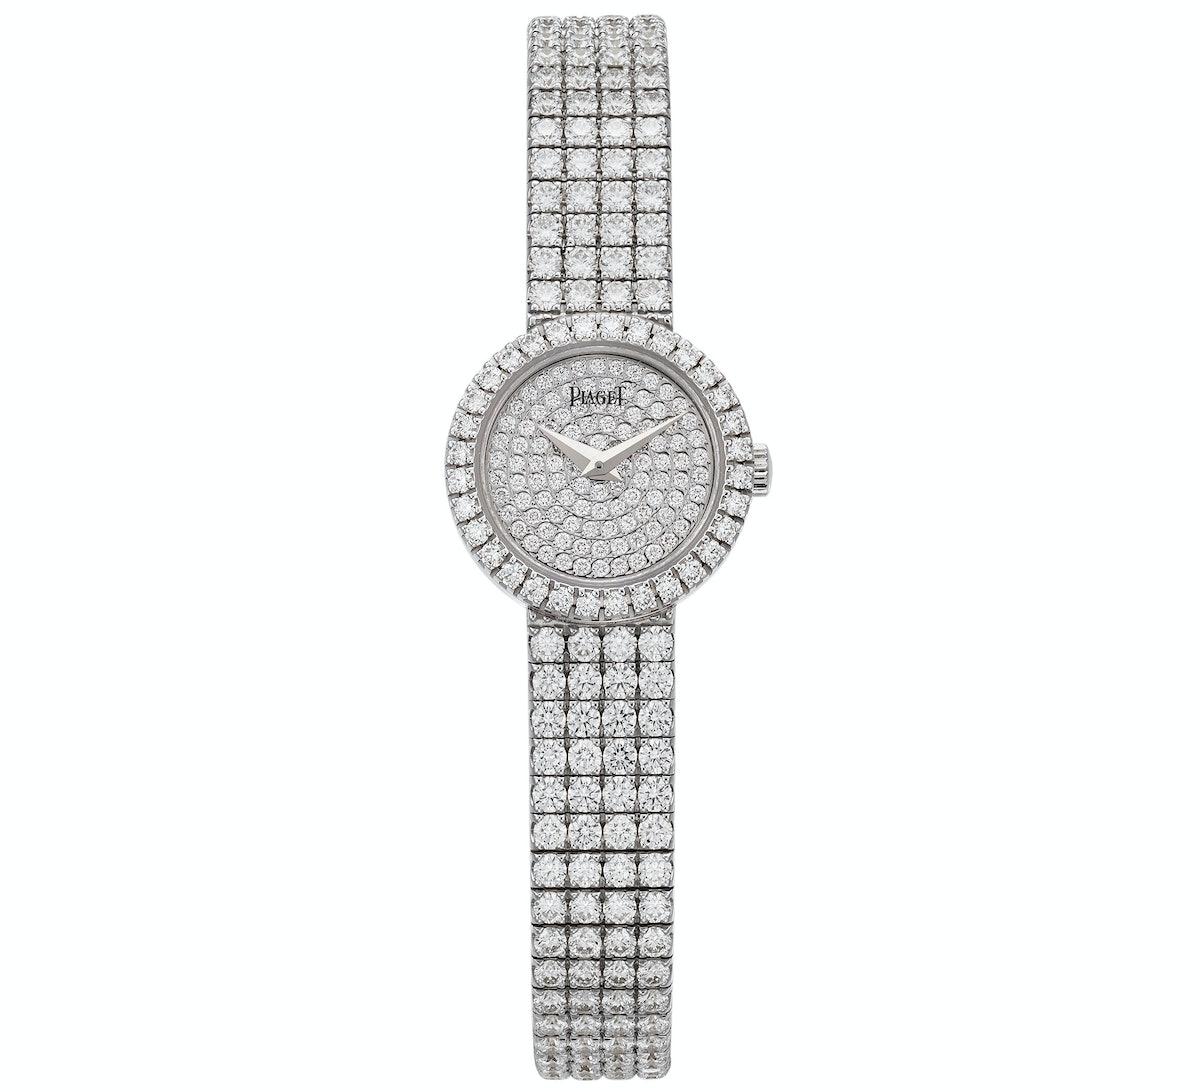 Piaget 18k white gold and diamond watch